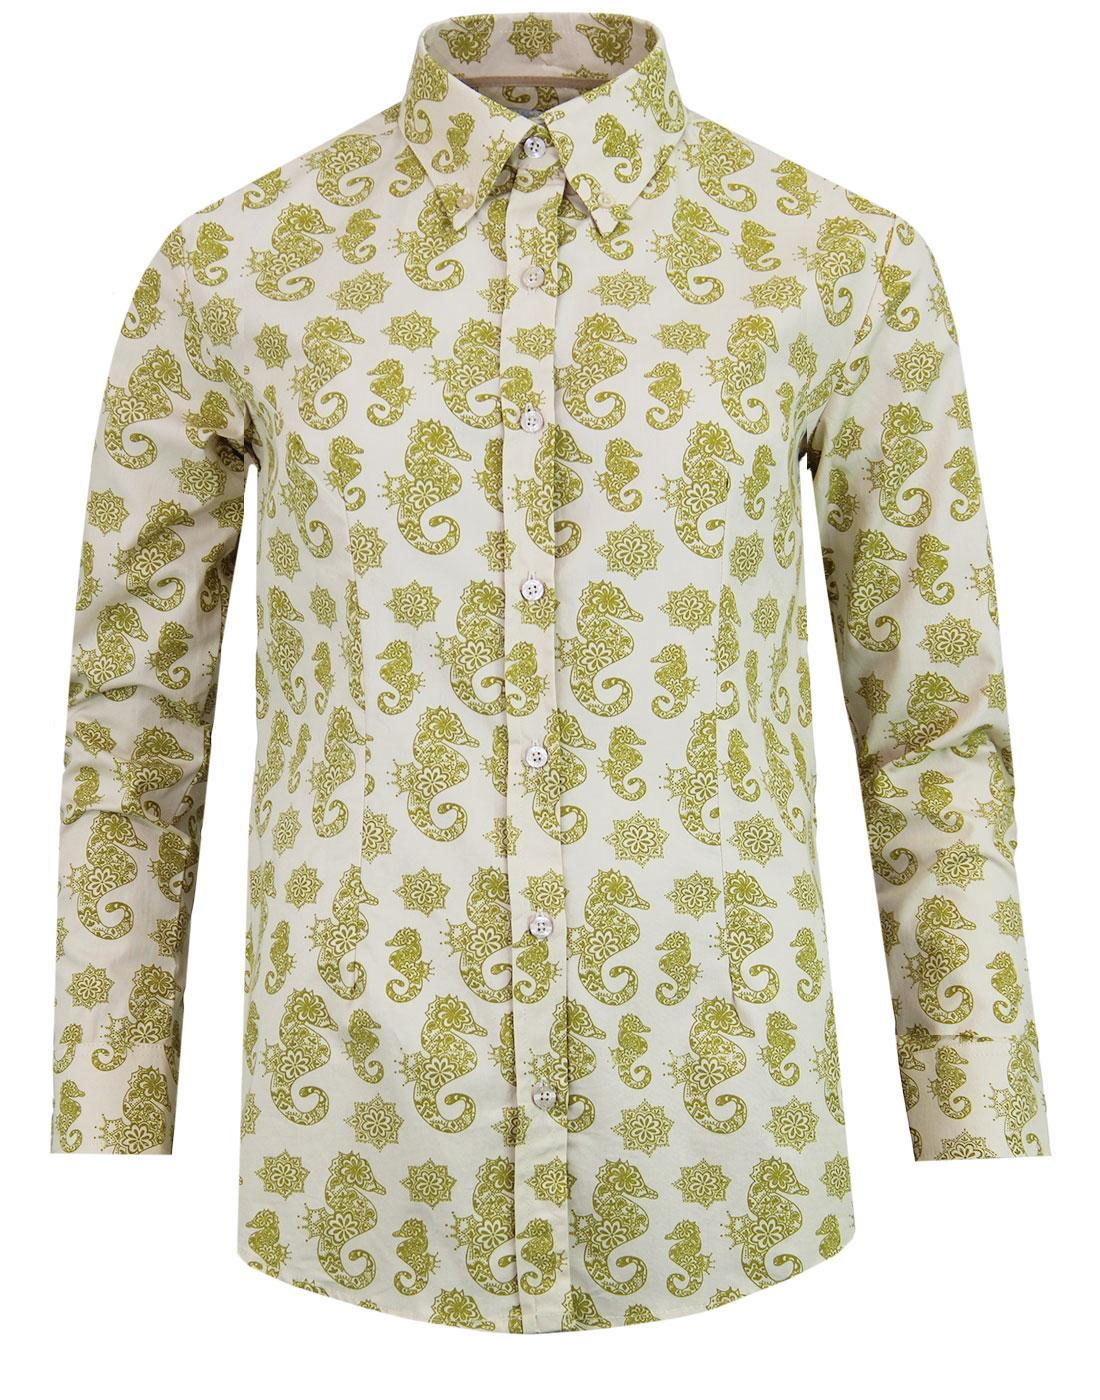 madcap england poseidons seahorse retro 60s shirt